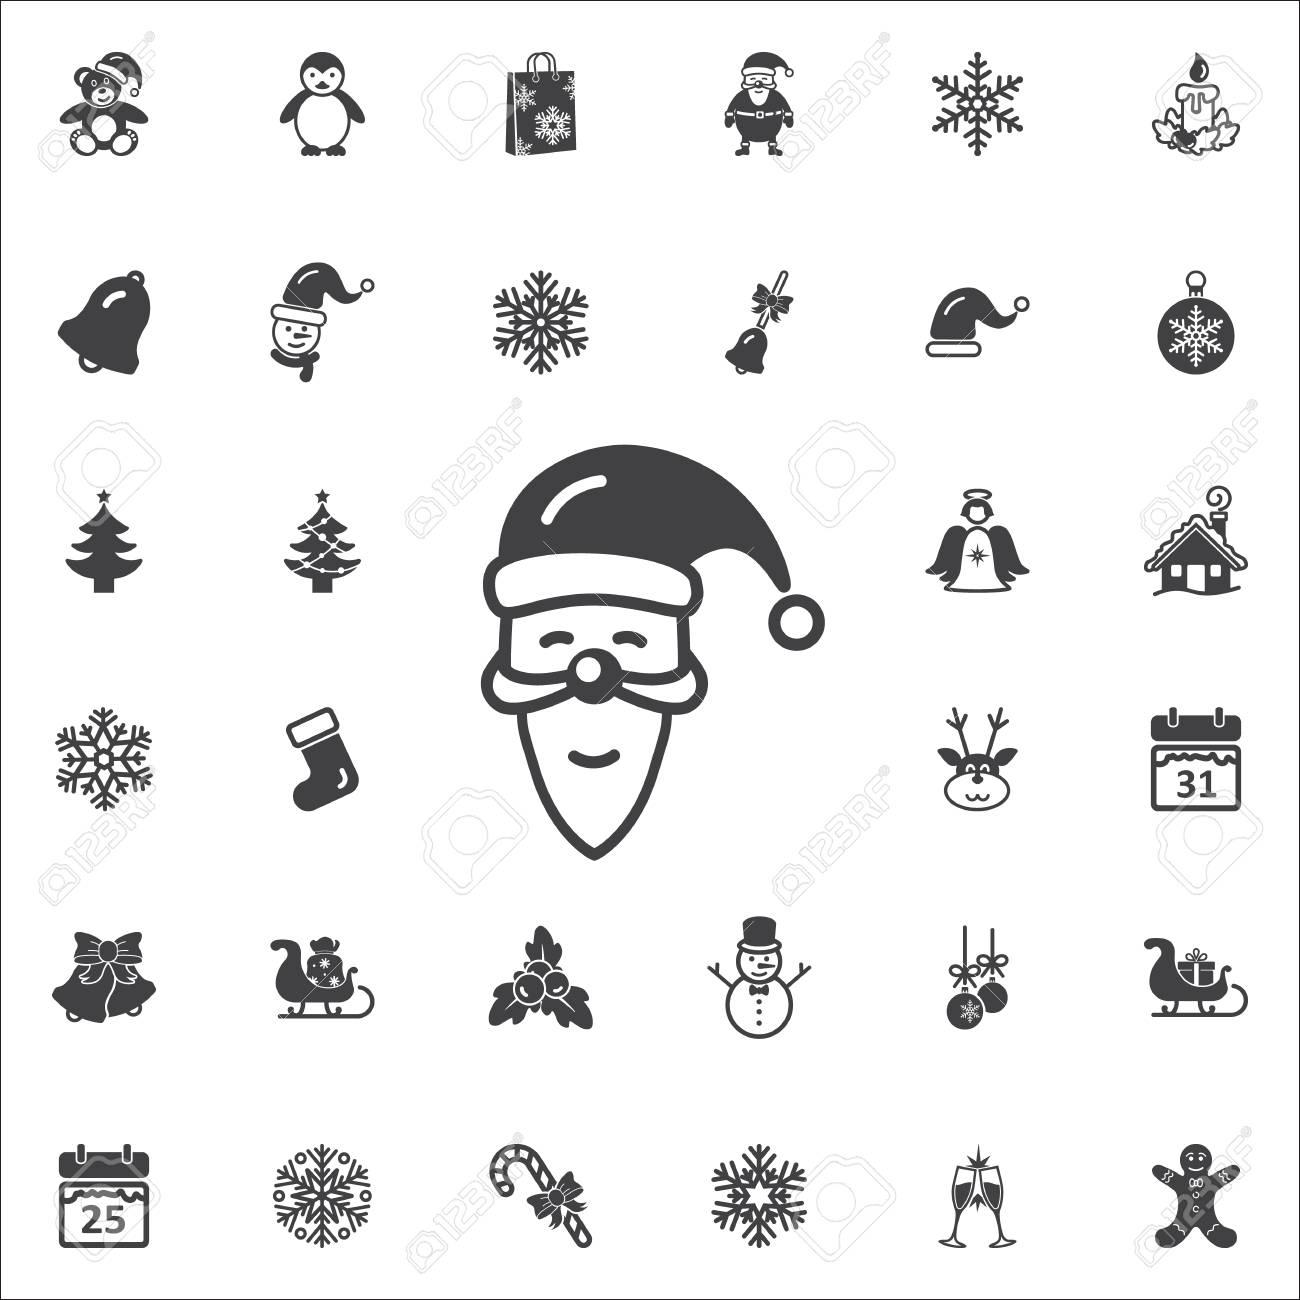 Christmas Holidays Icon.Santa Claus Icon New Year Set Of Icons Christmas Holidays